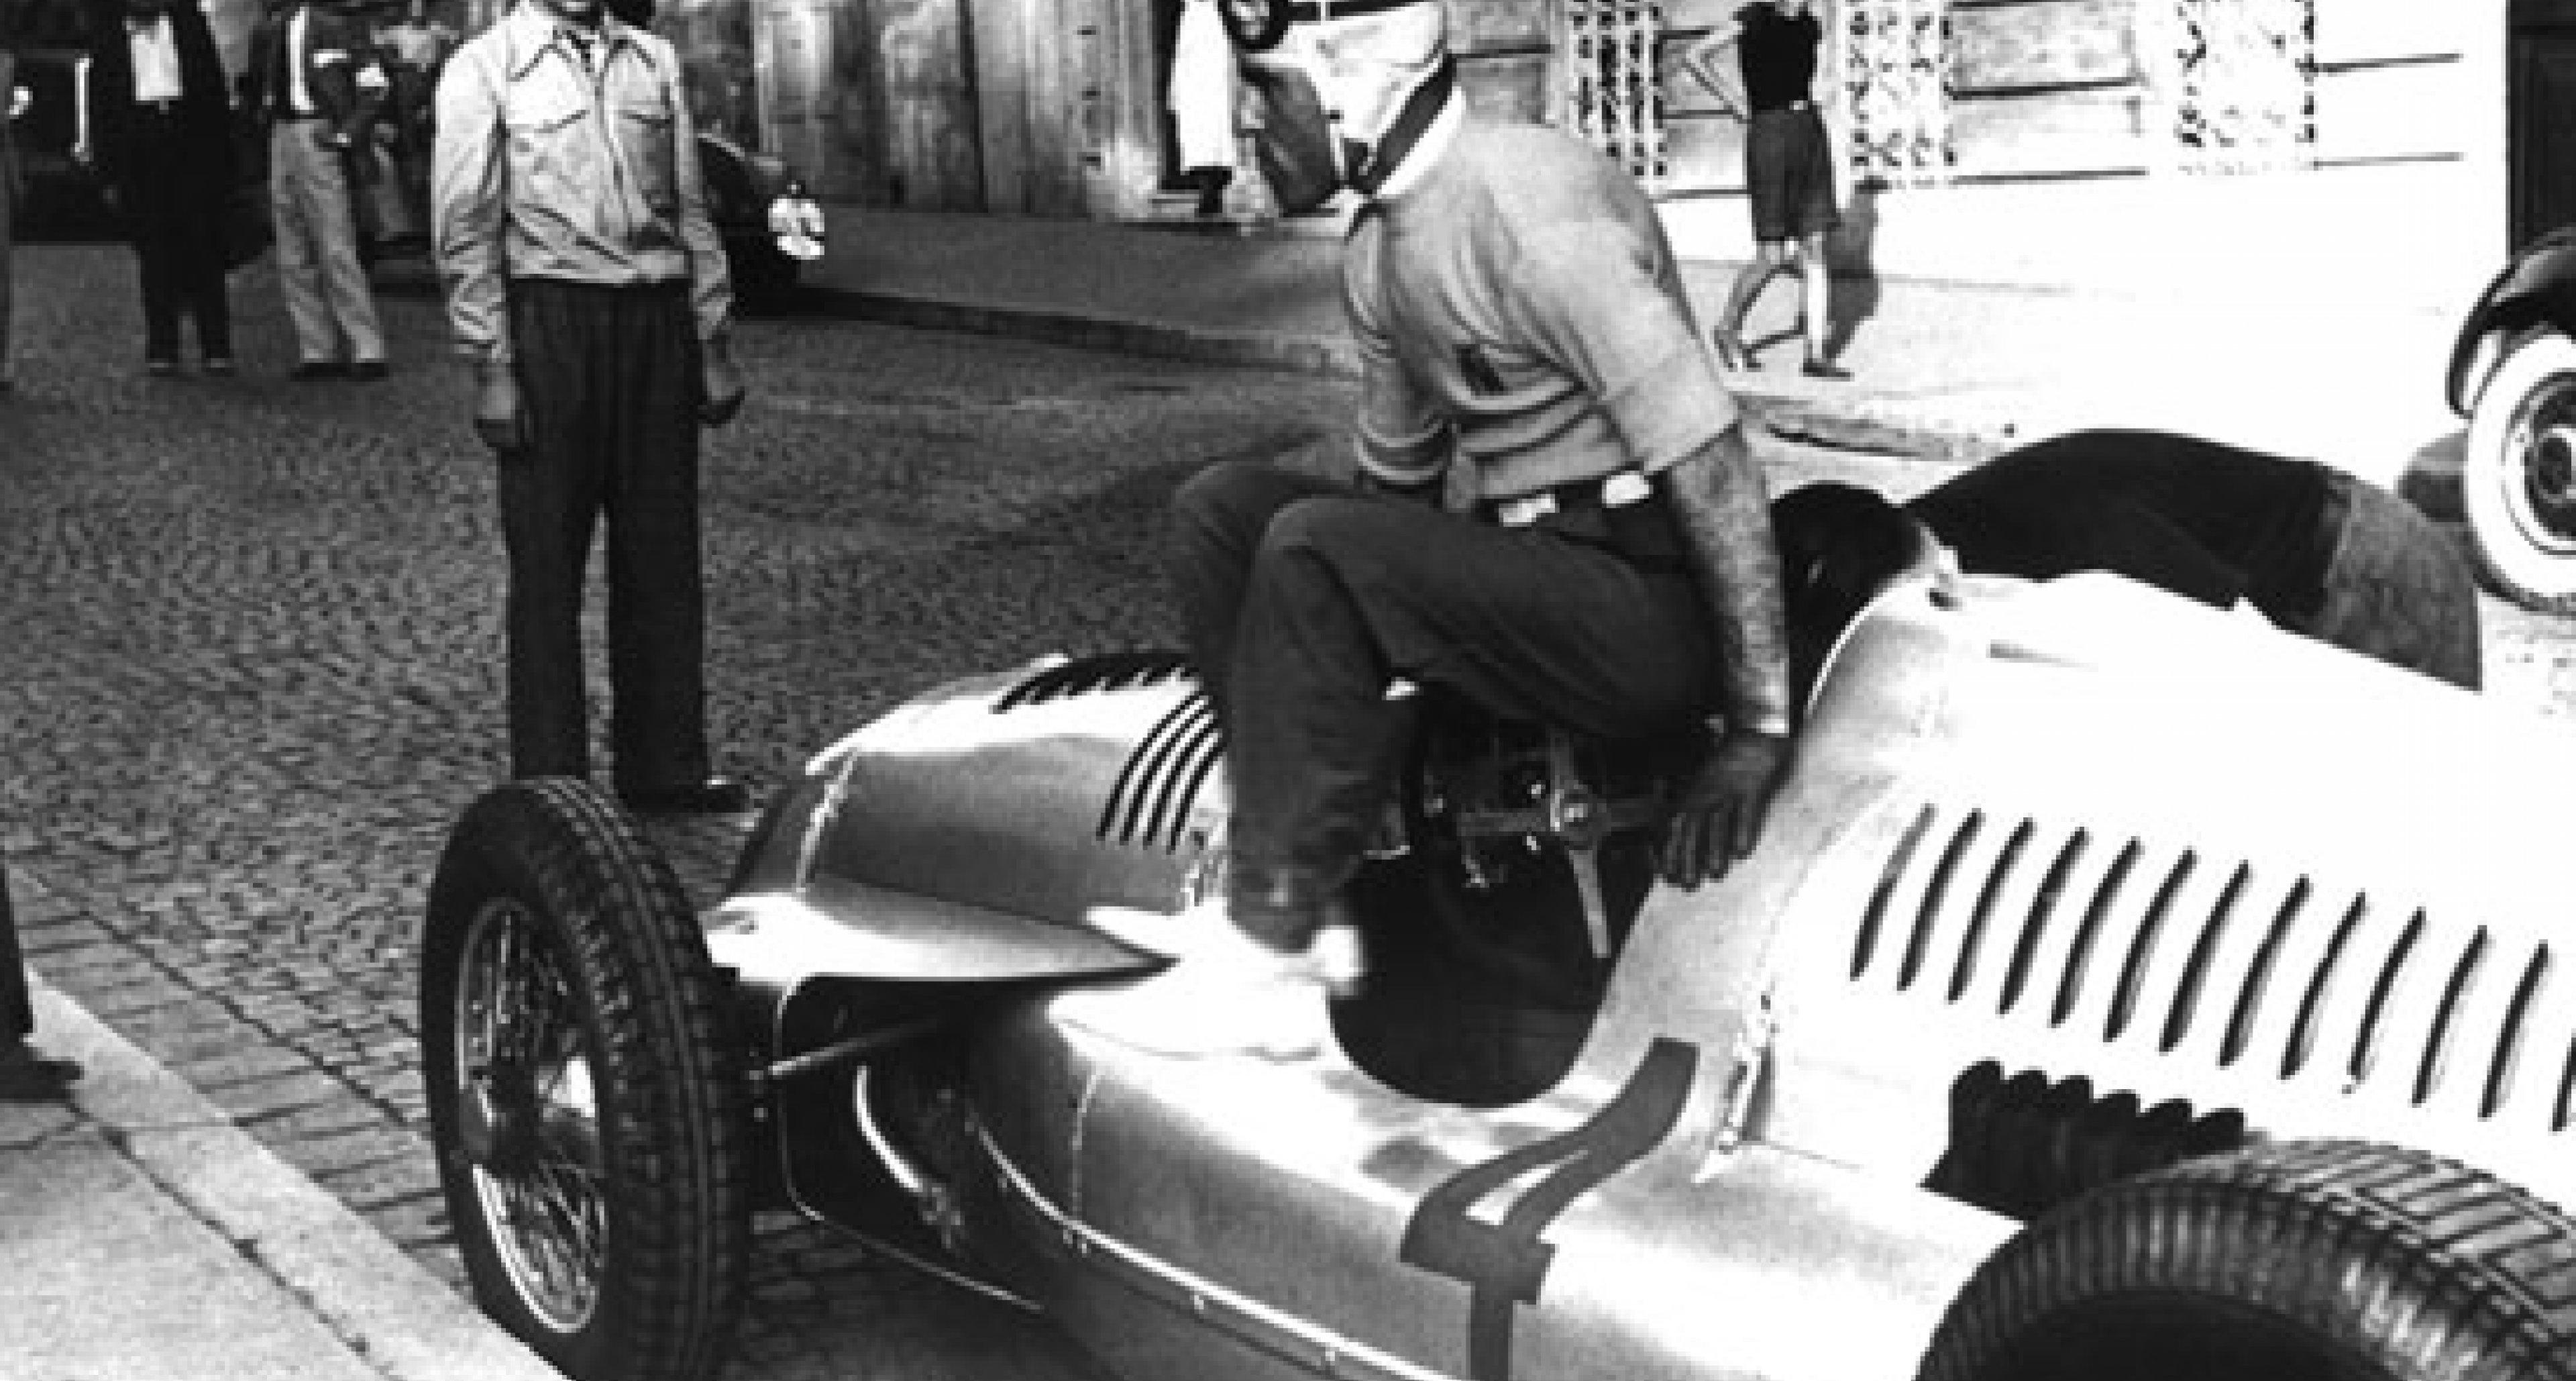 Tazio Nuvolari – the legendary racing driver from Mantua